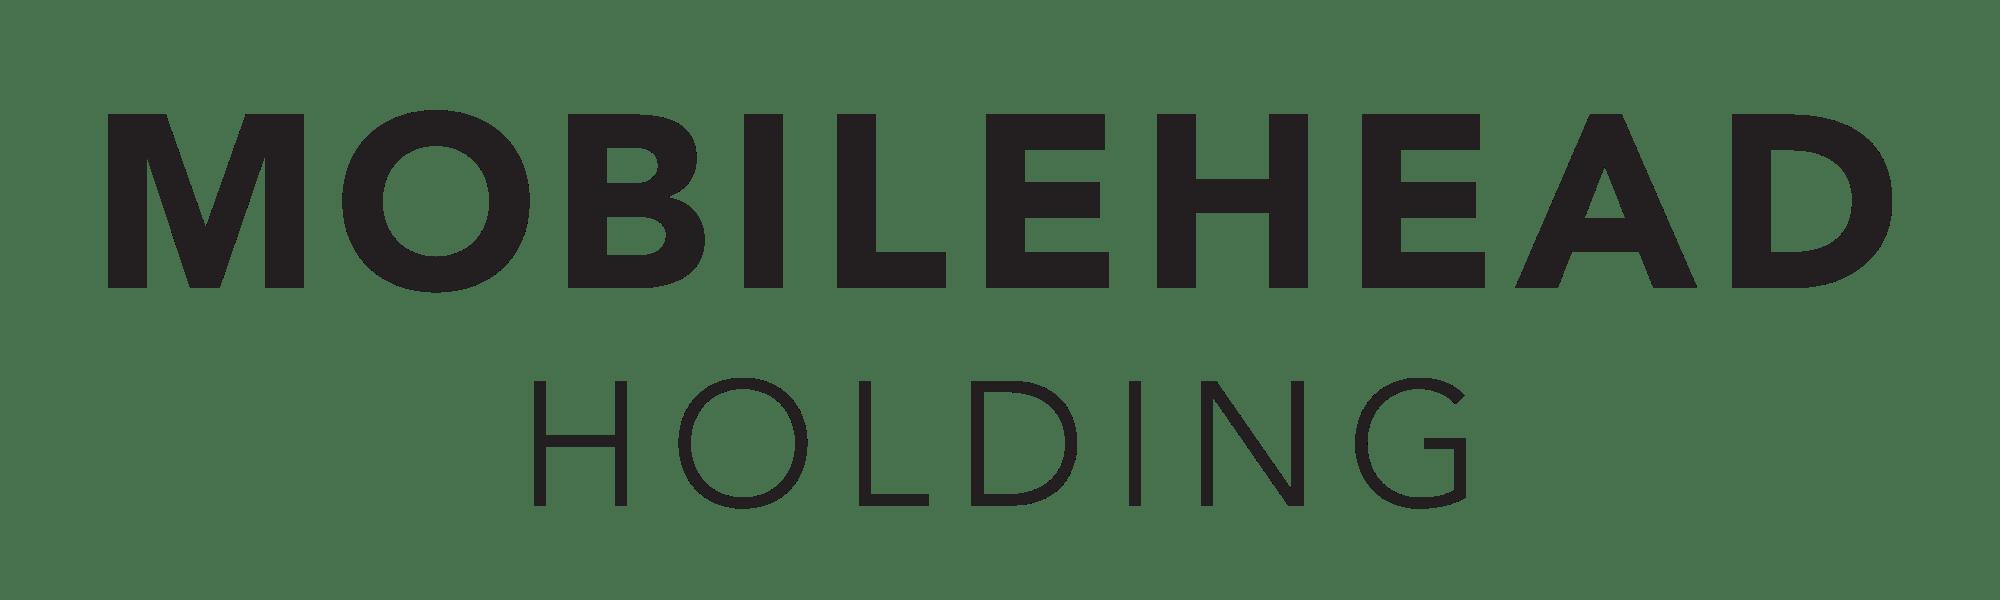 Mobilehead company logo